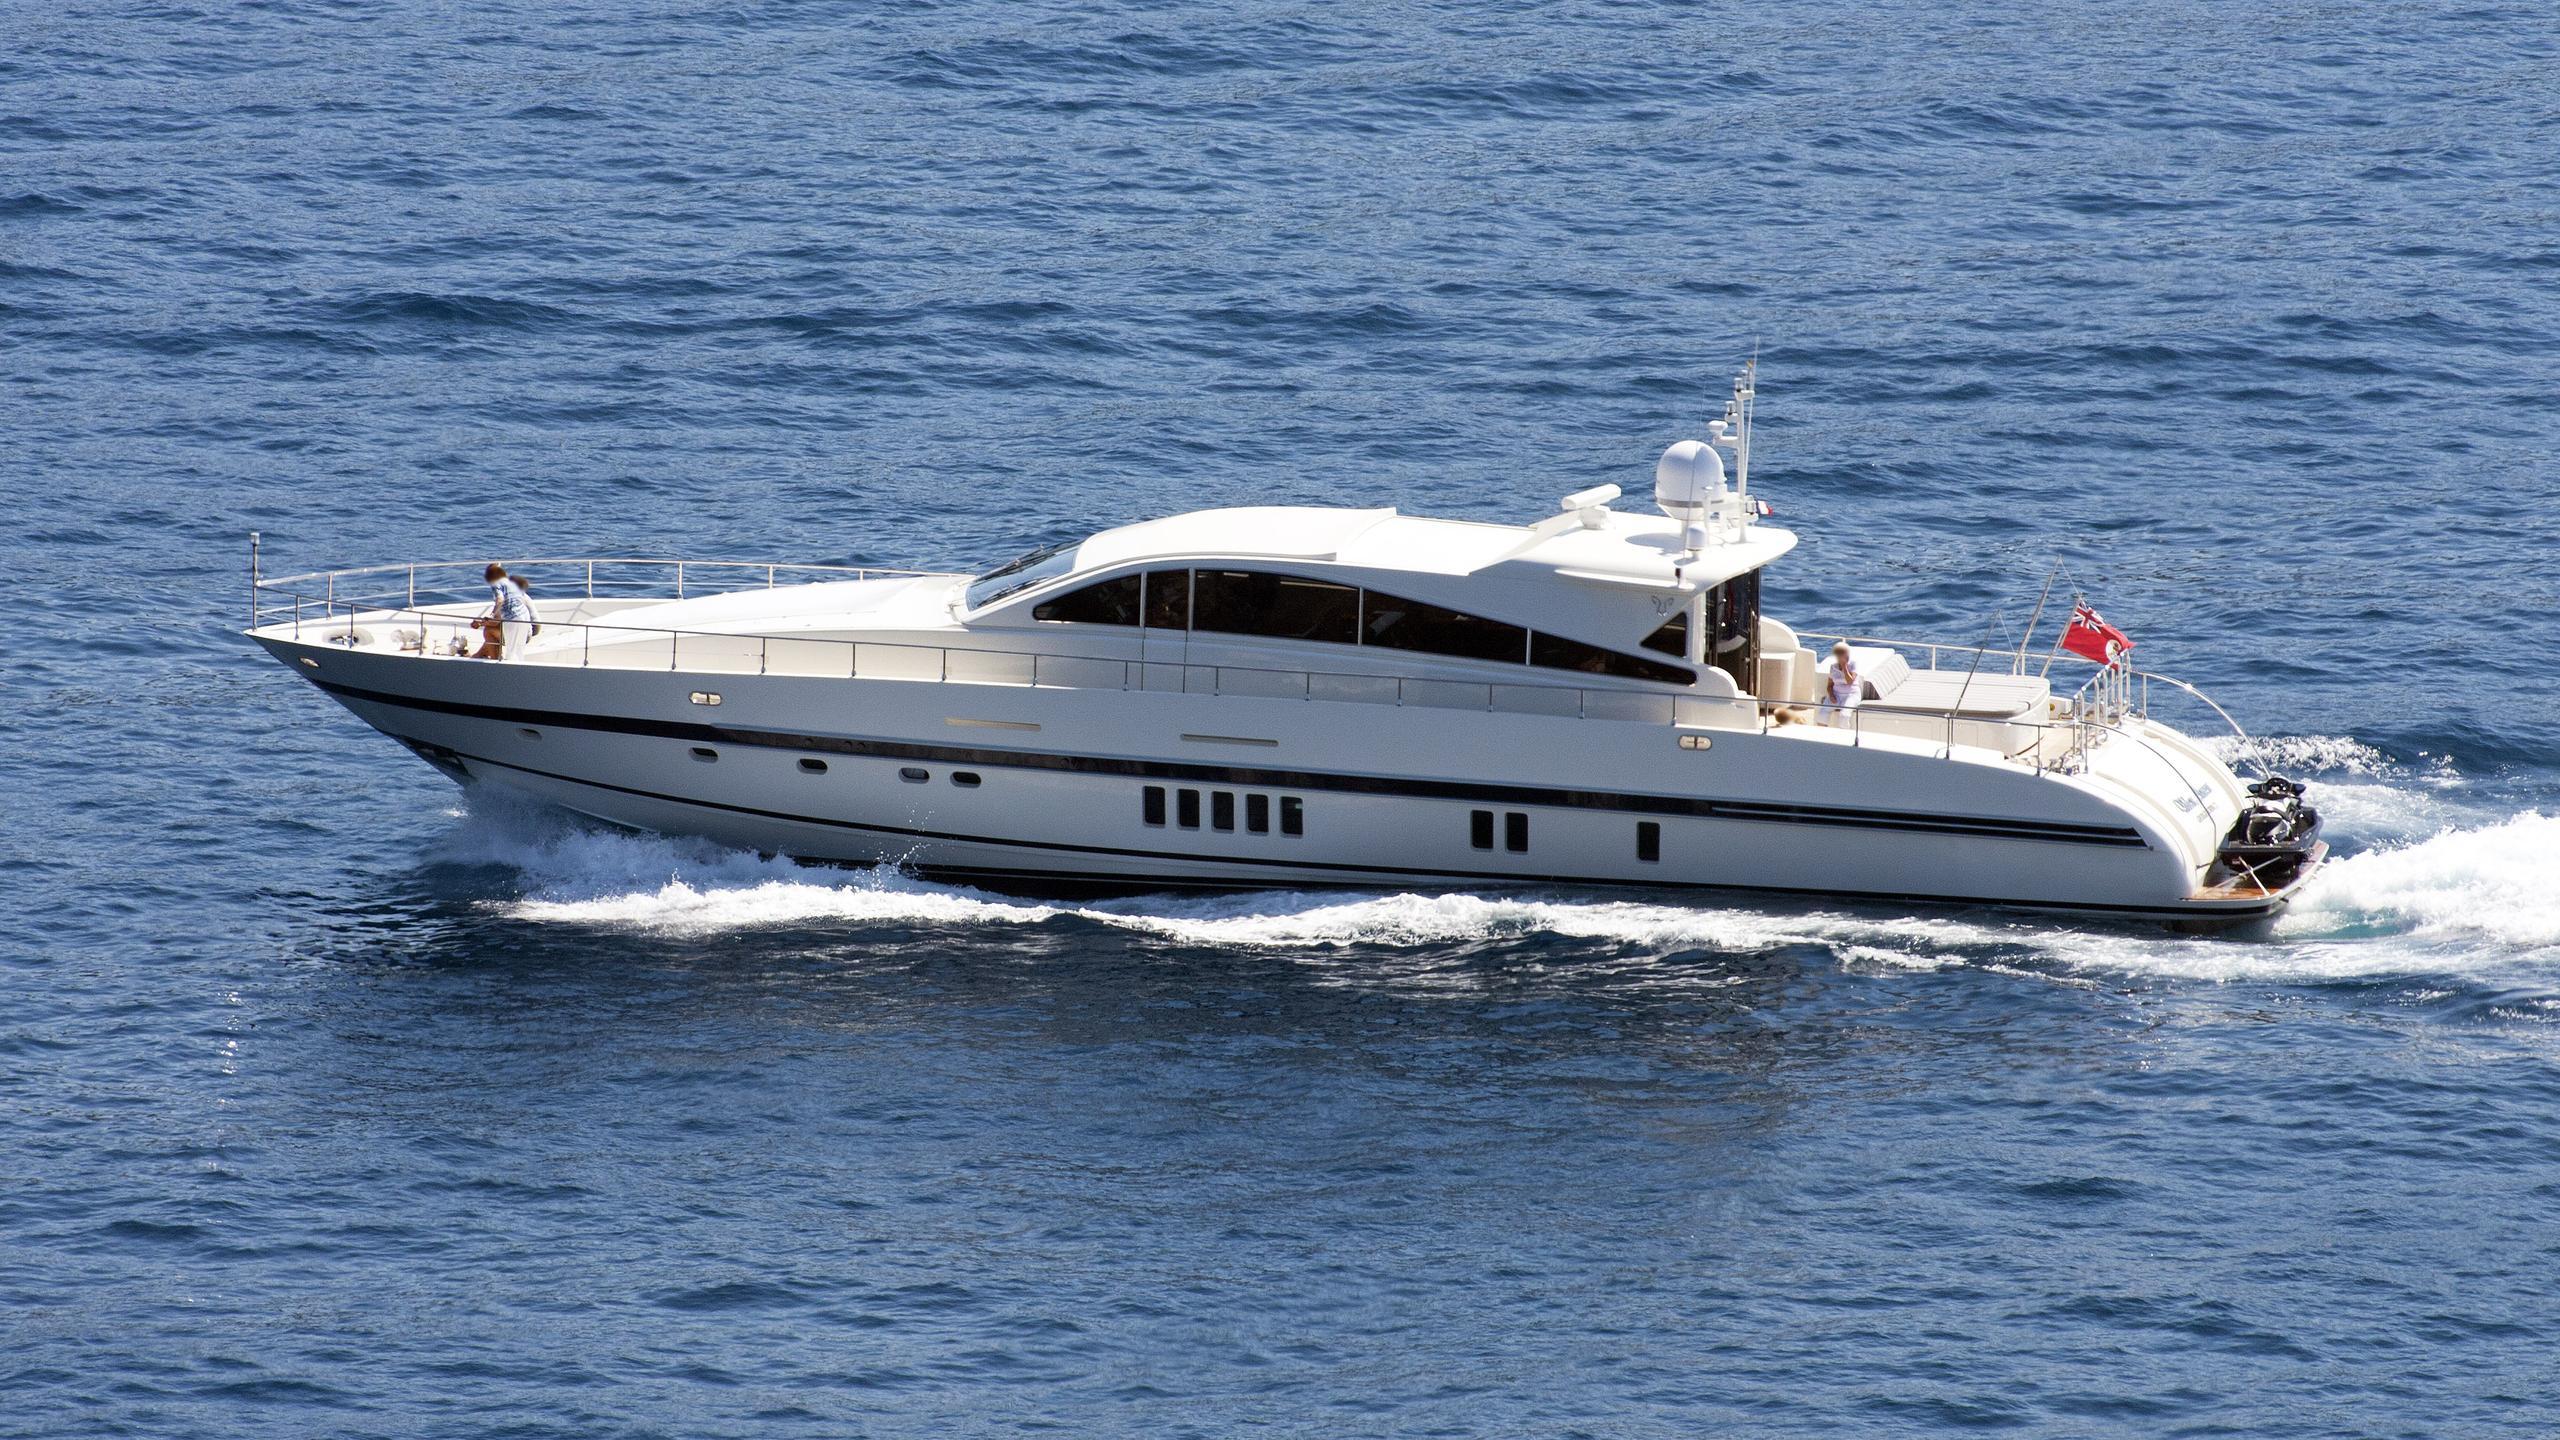 volare-ancora-motor-yacht-arno-leopard-27-sport-2010-27m-cruising